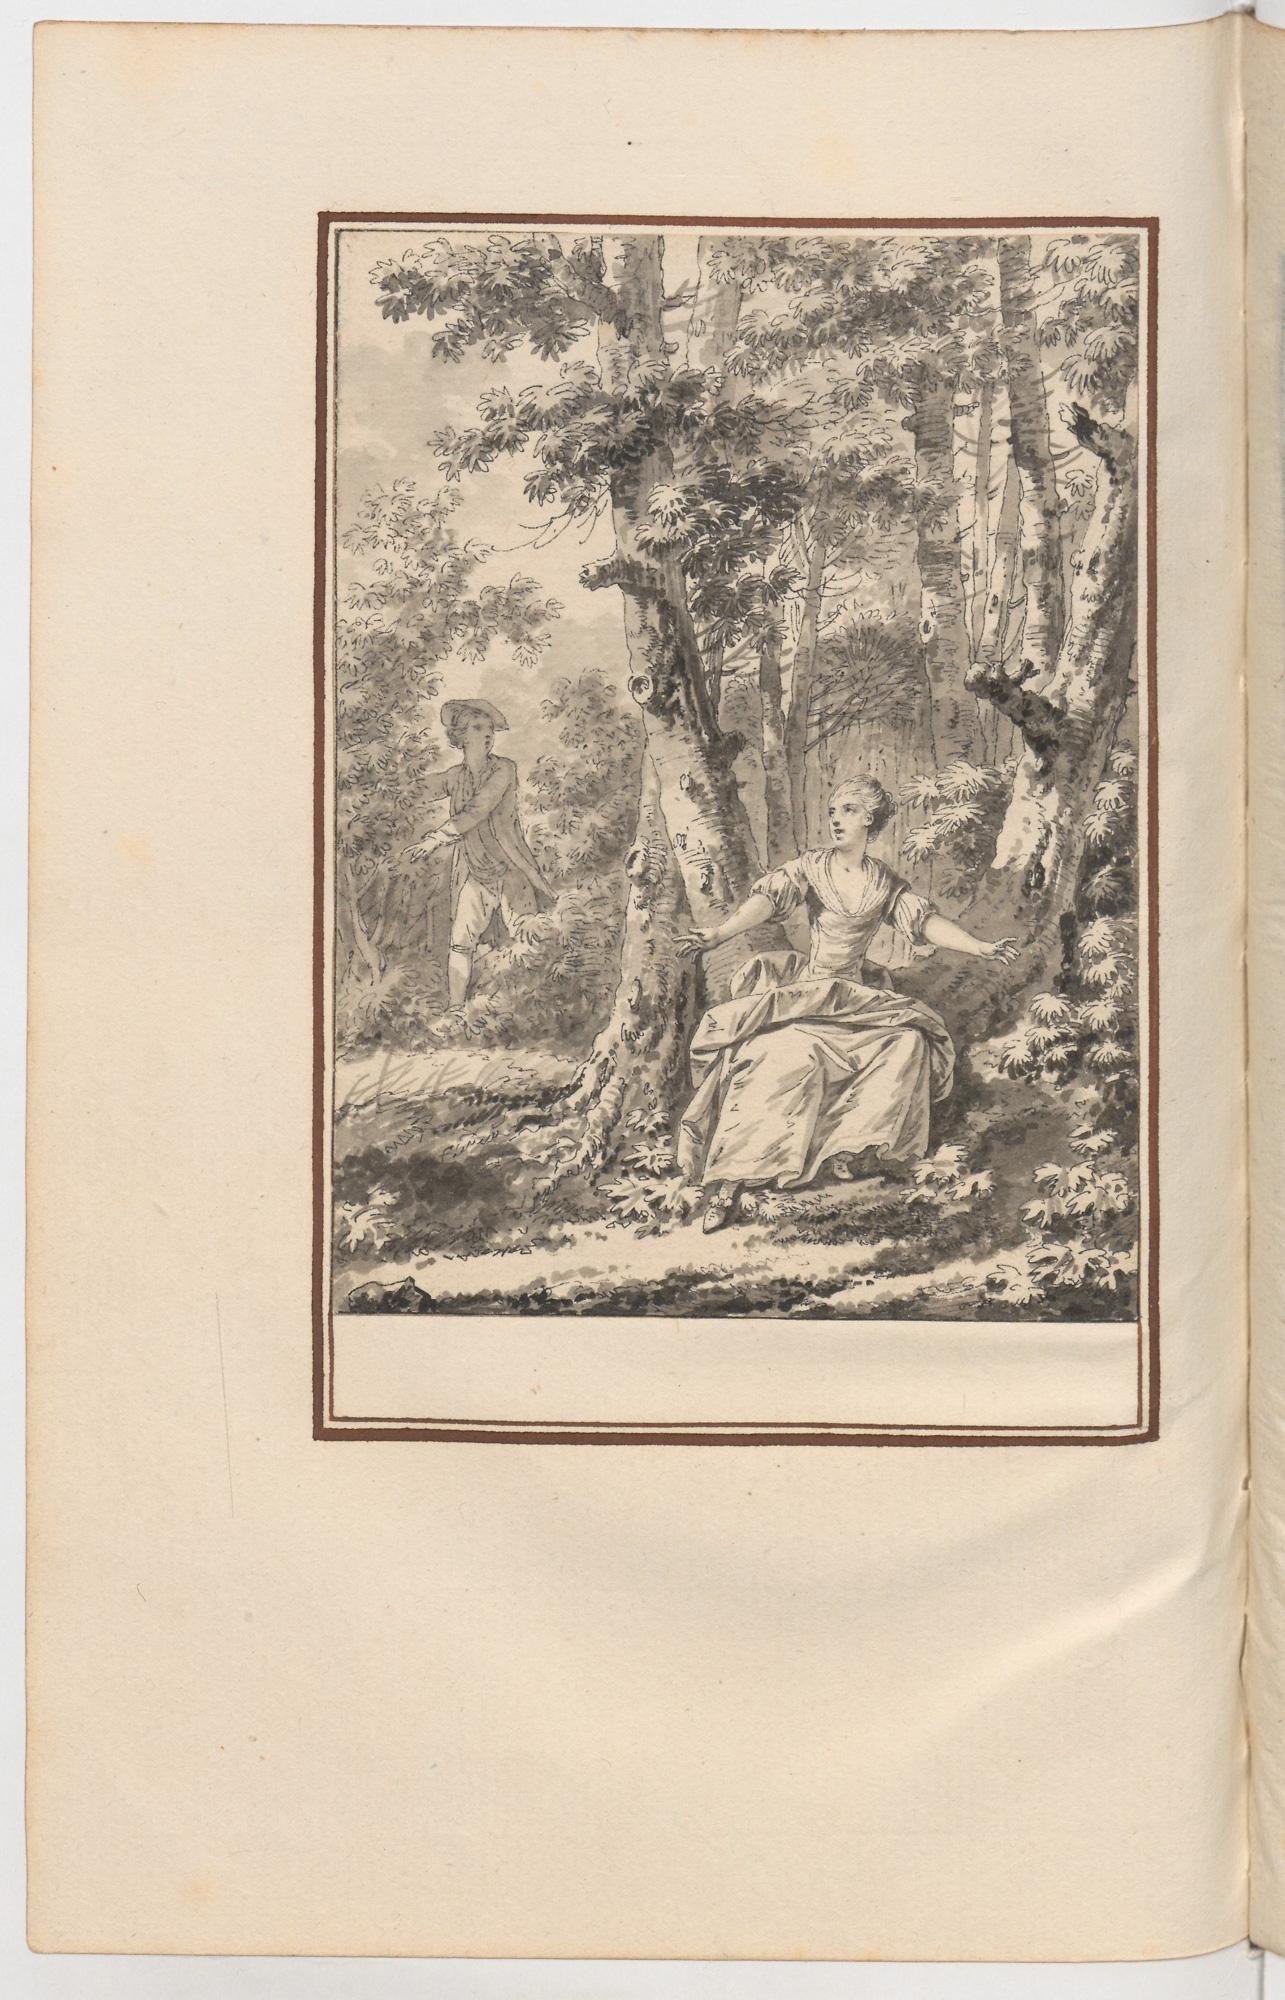 S.4.22 La resolution inutile, Chantilly, Image